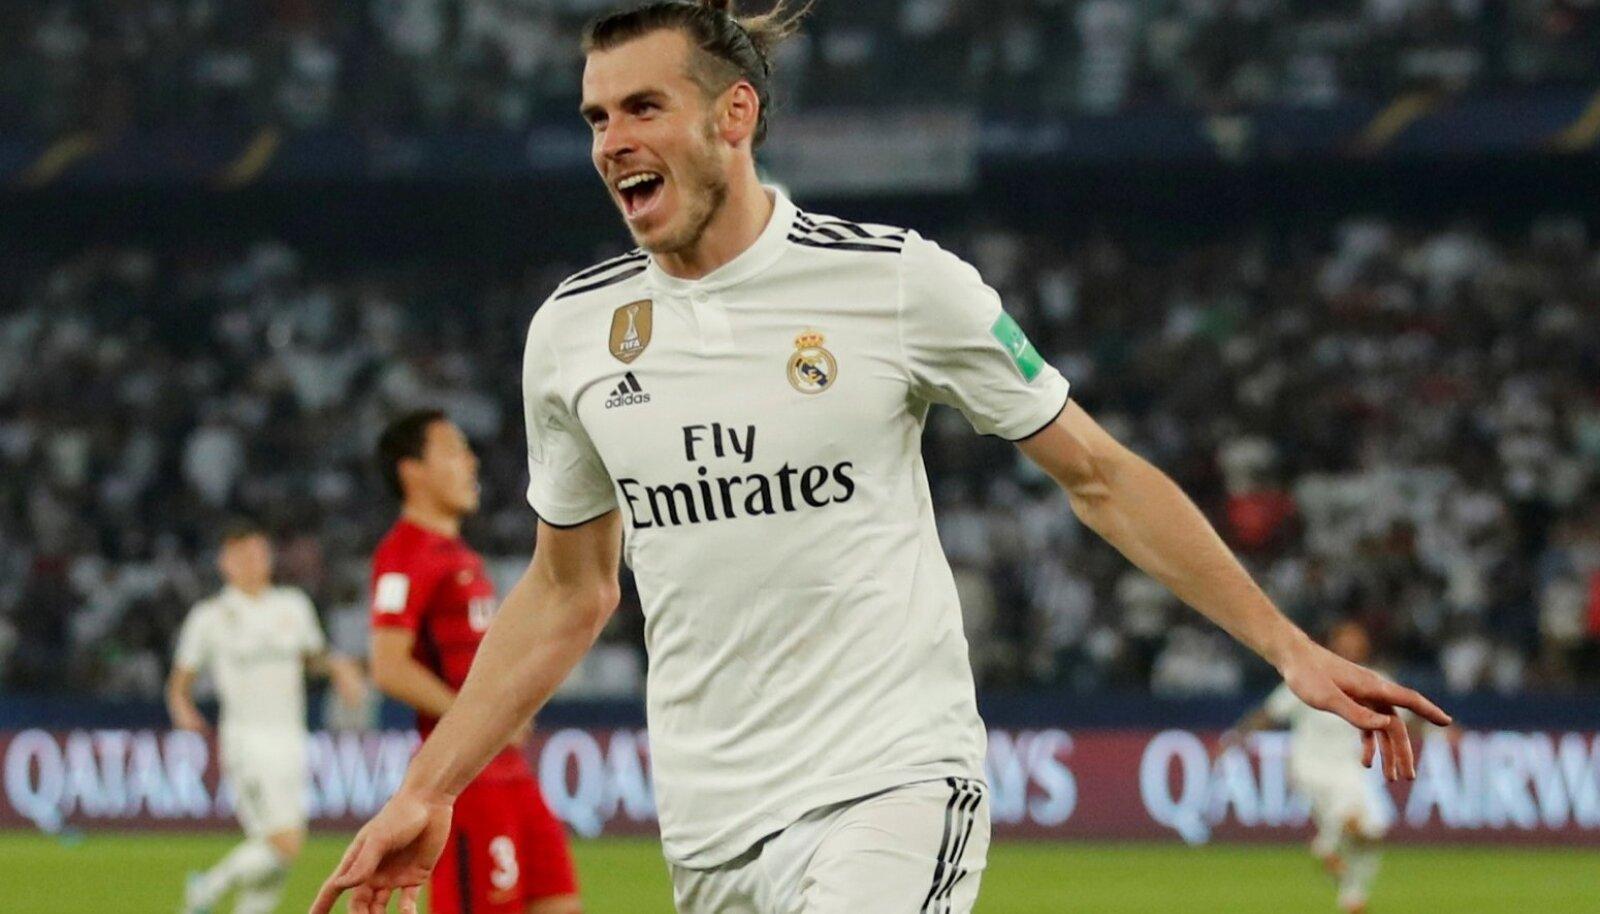 FILE PHOTO: Club World Cup - Semi-Final - Kashima Antlers v Real Madrid